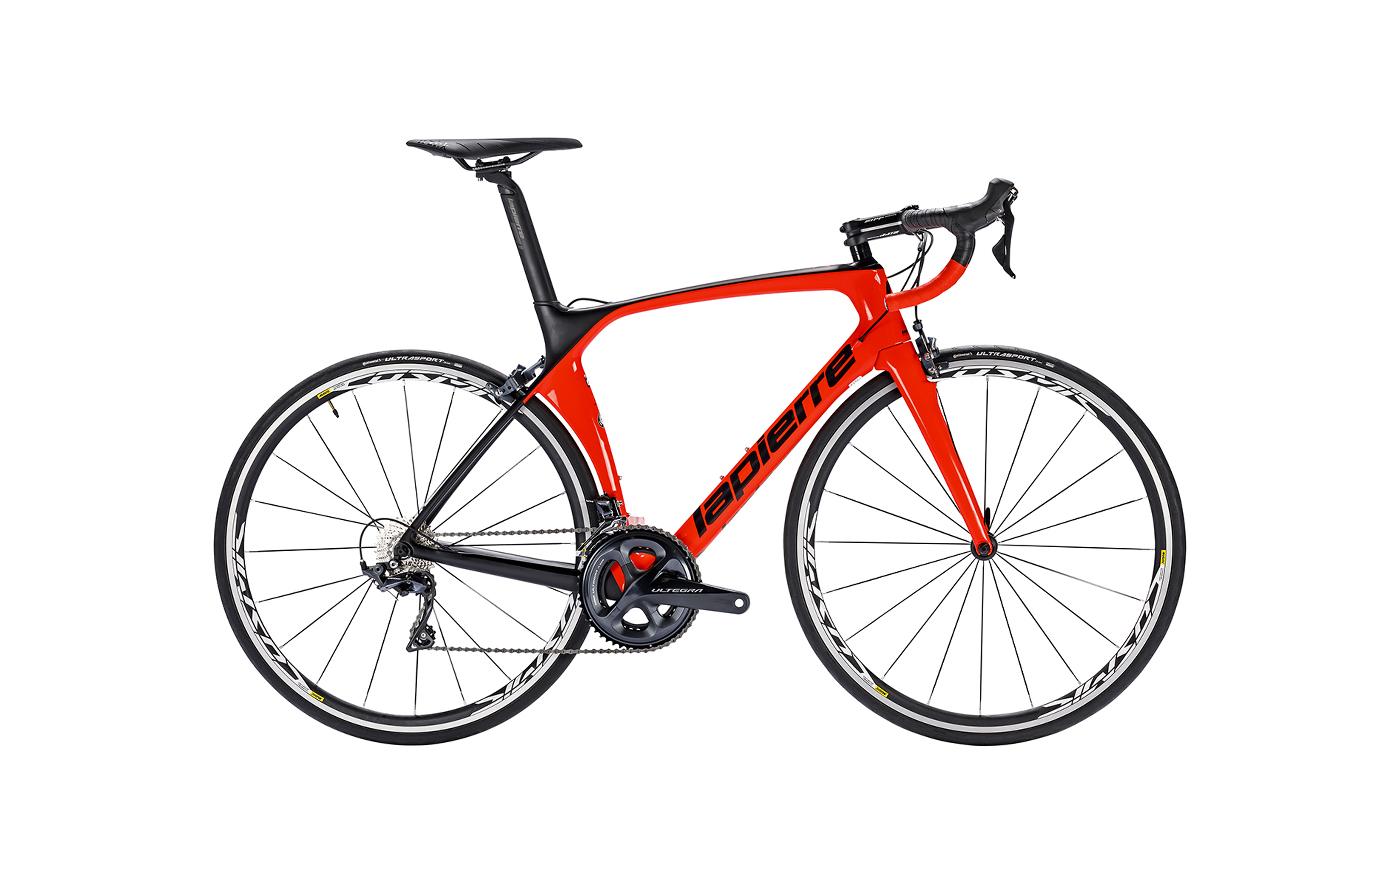 Bicykel LAPIERRE AIRCODE SL 600 MC 2018